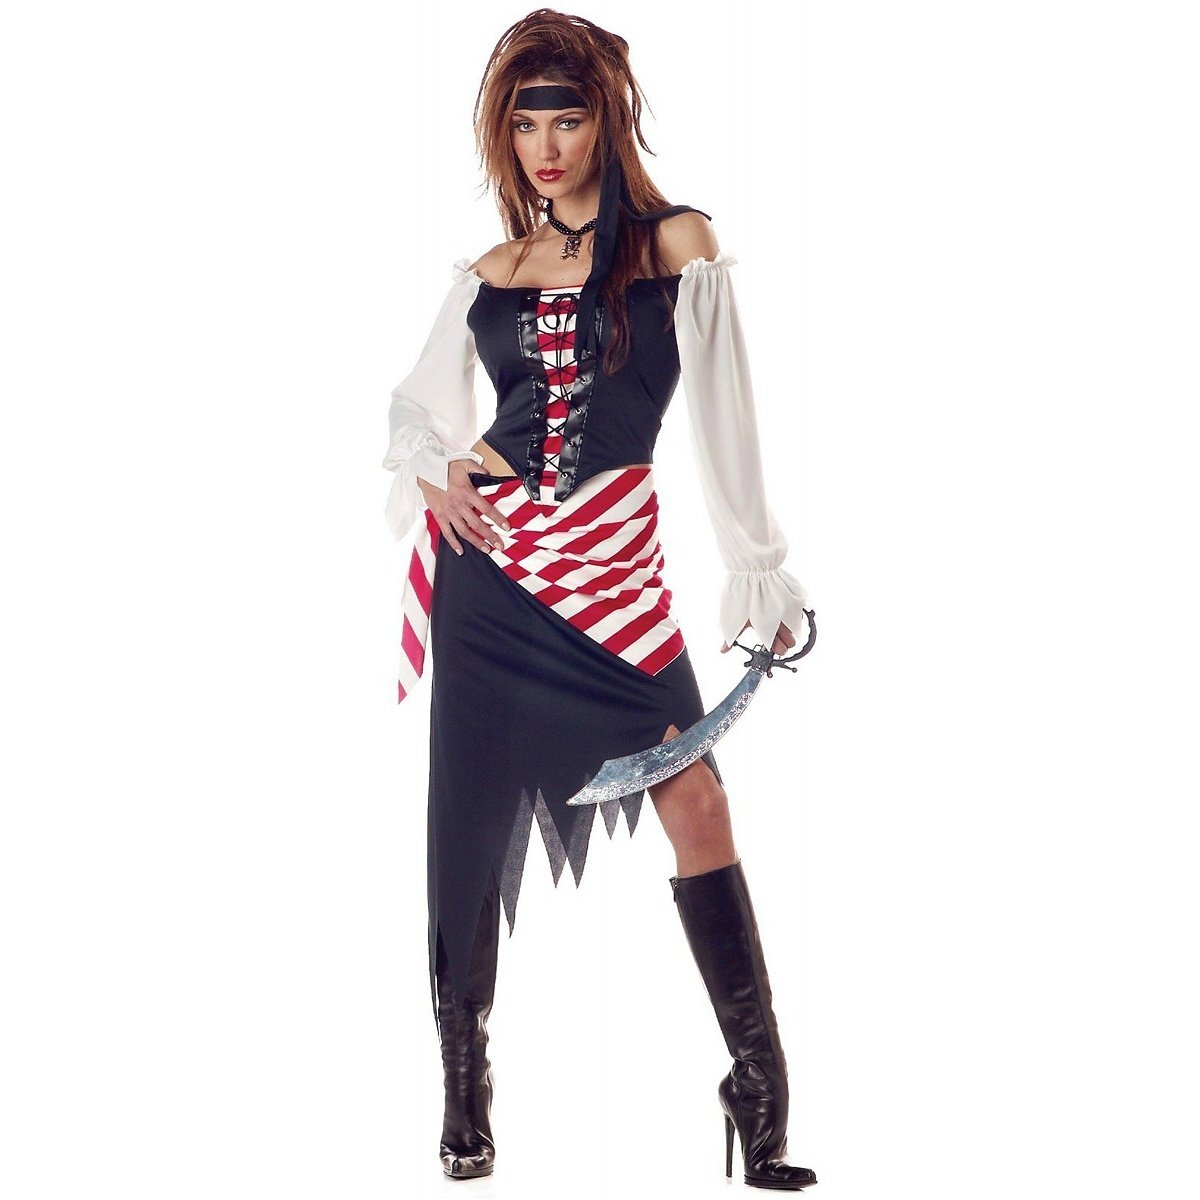 c29c3a4b13 Amazon.com  California Costumes Women s Adult-Ruby